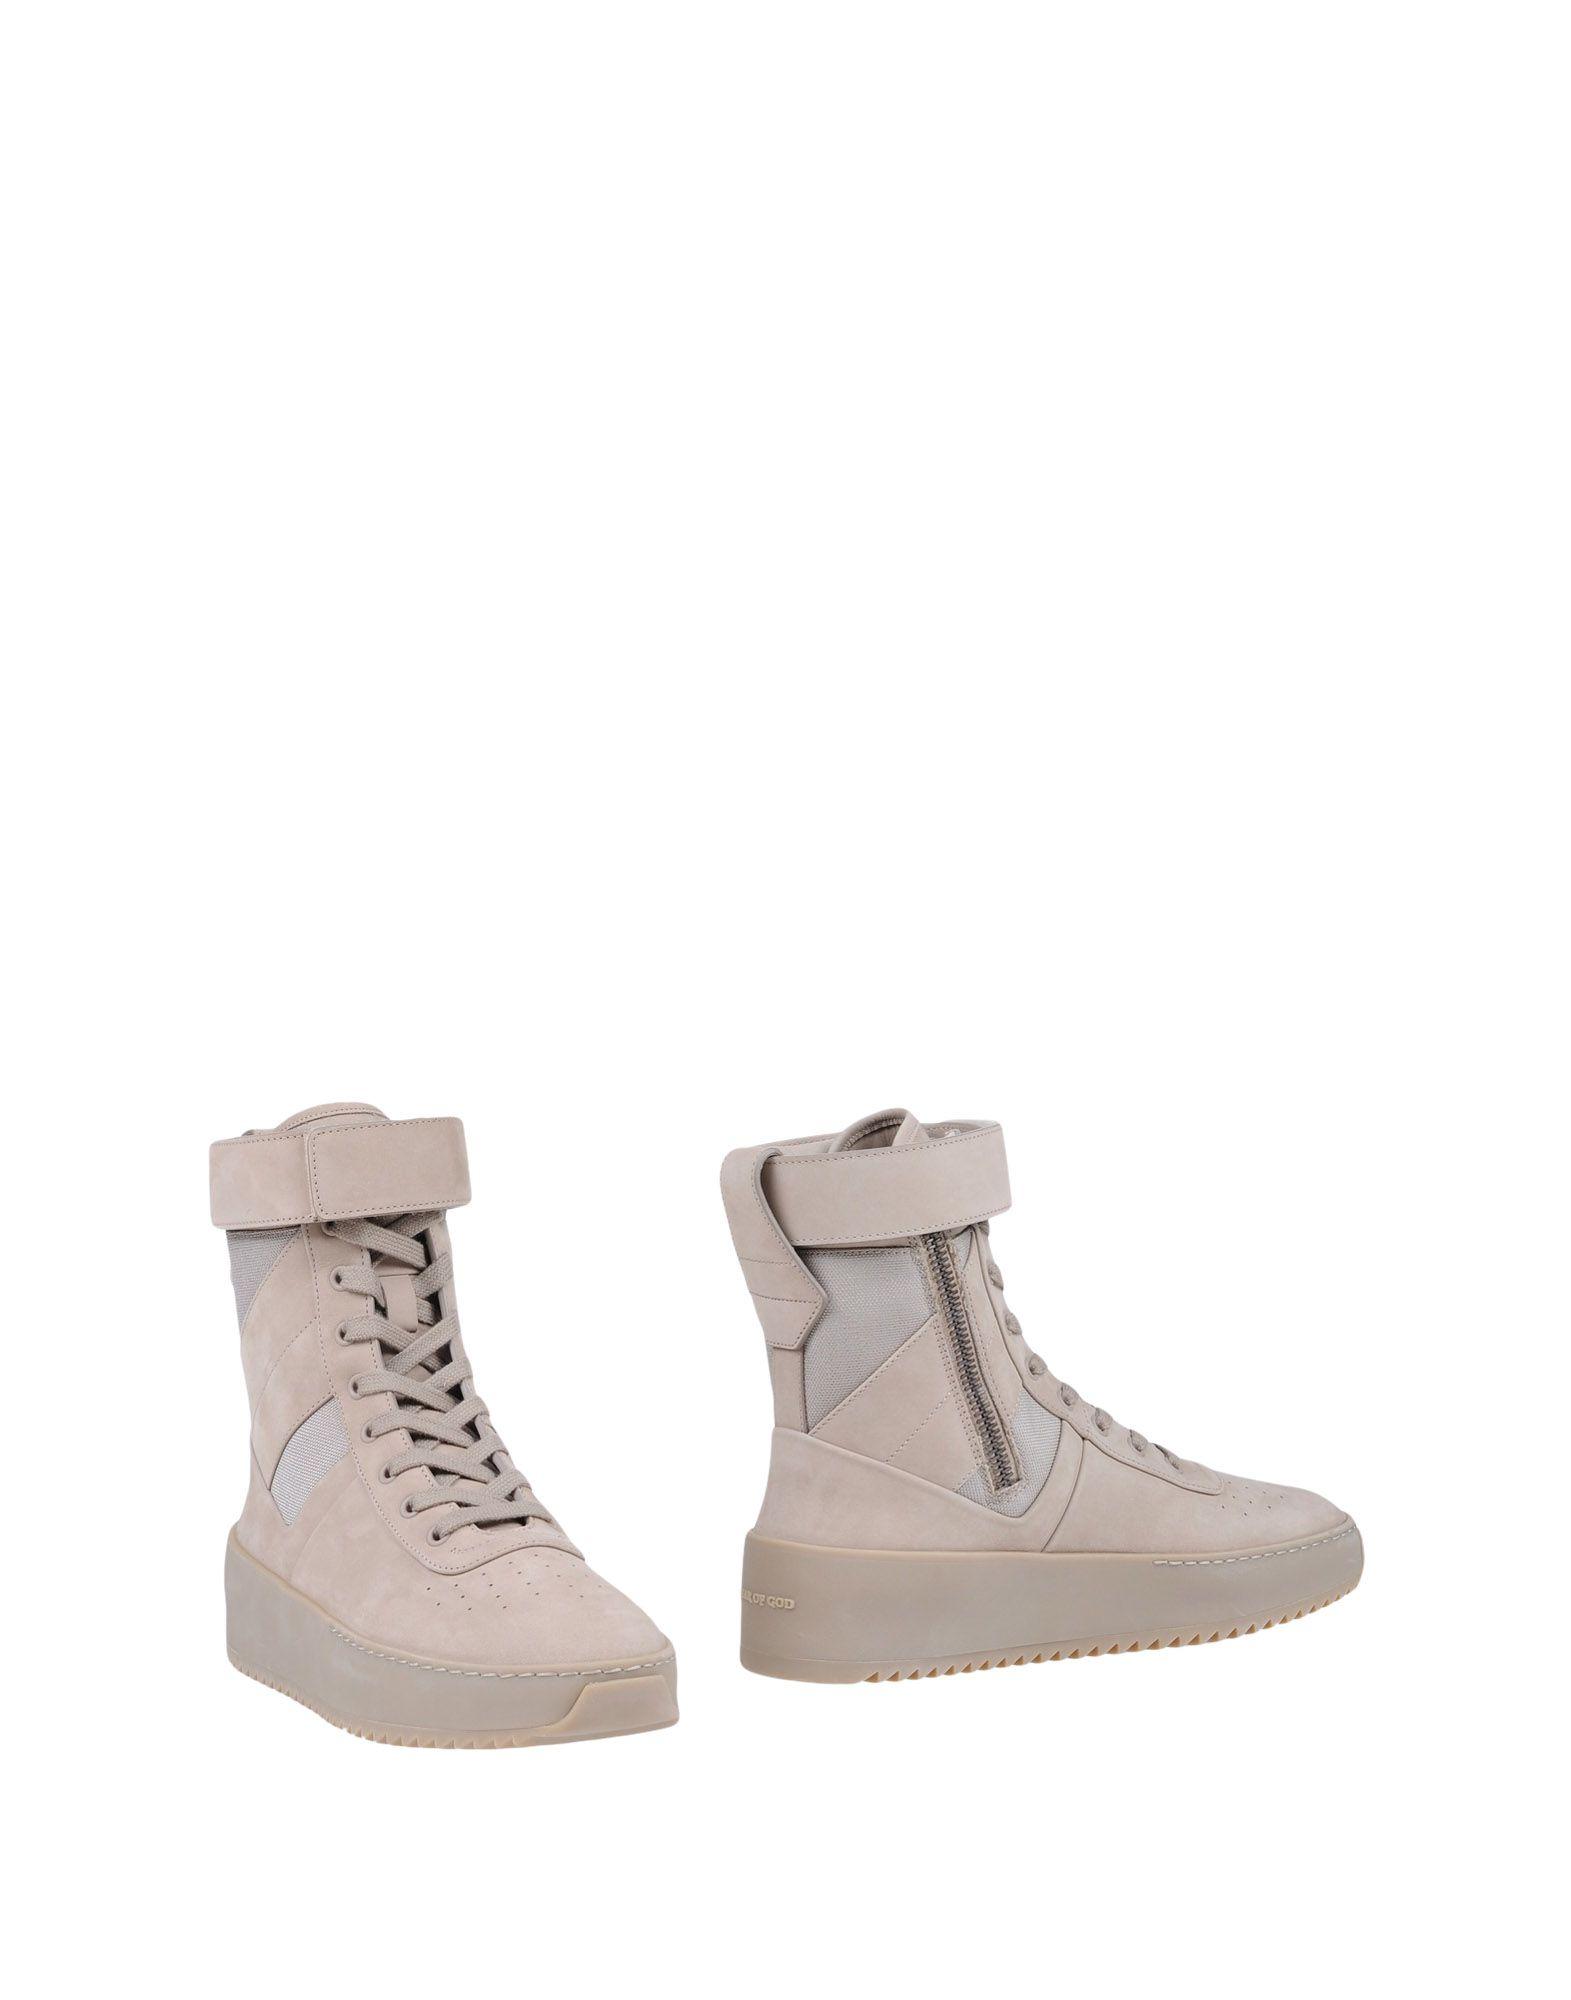 Fear Of God Stiefelette aussehende Damen  11376176LWGünstige gut aussehende Stiefelette Schuhe 5ebf73